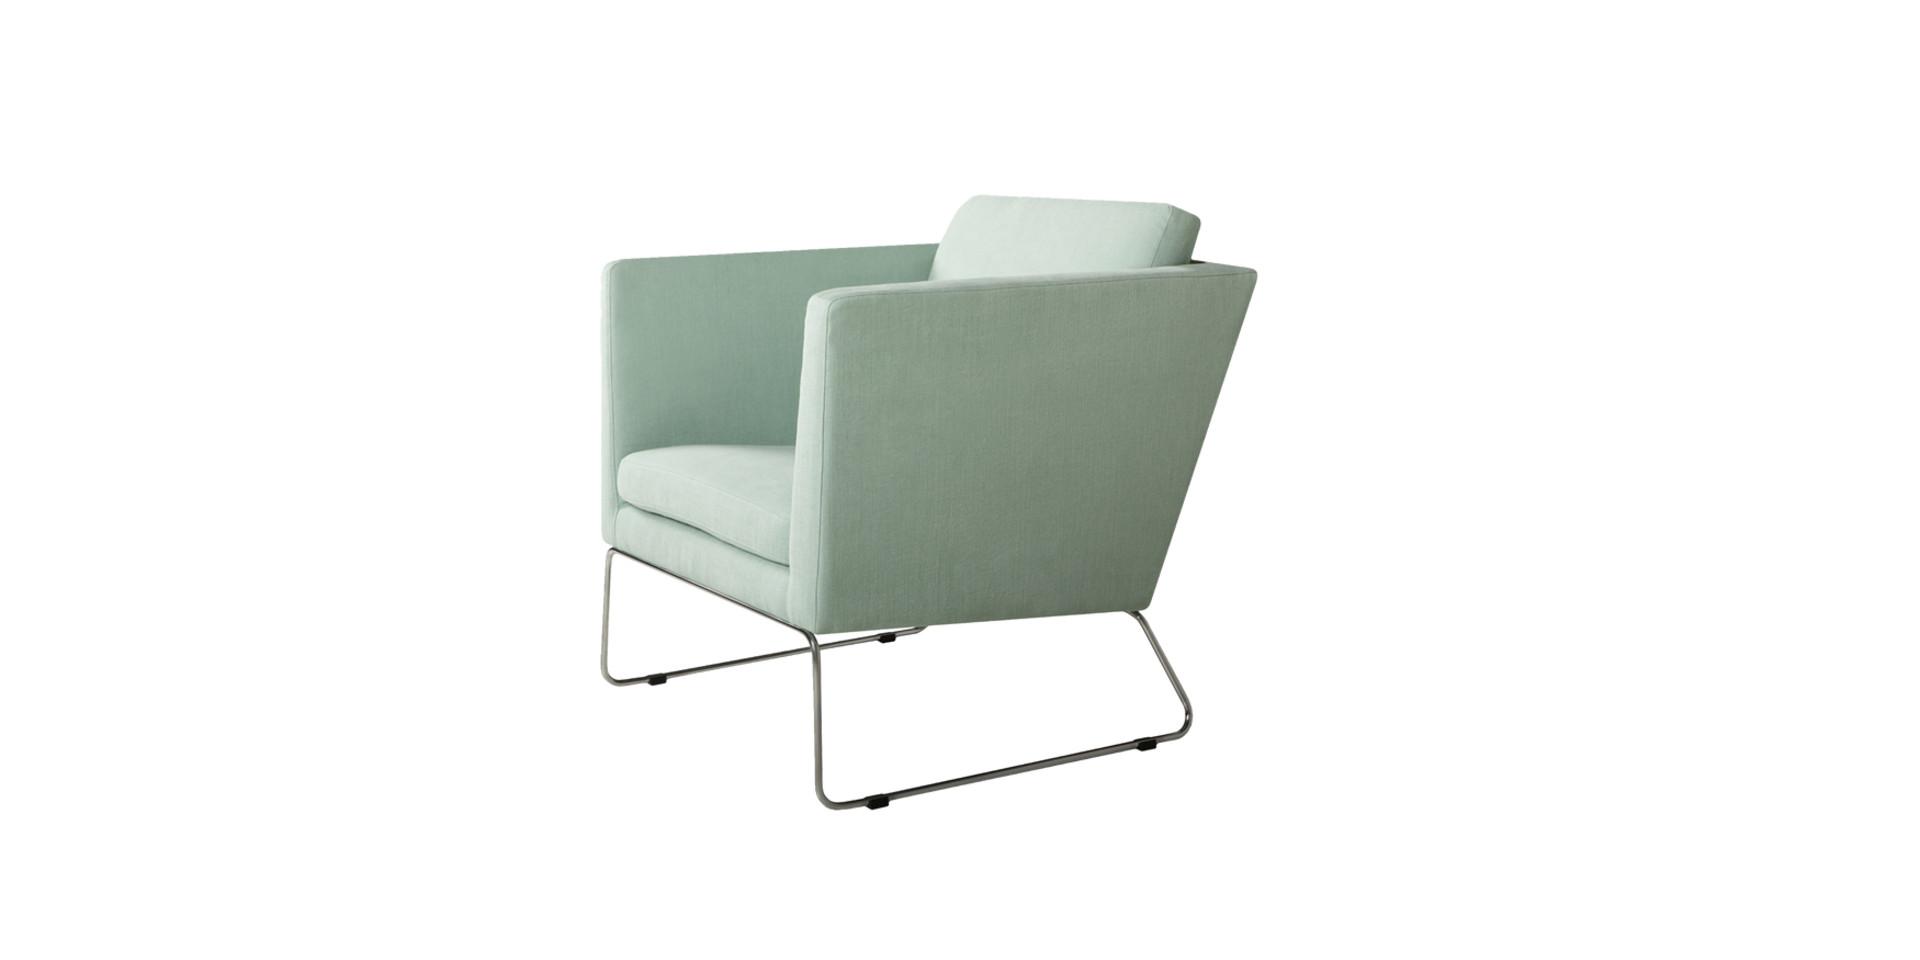 sits-clark-fauteuil-armchair_caleido2248_mint_3